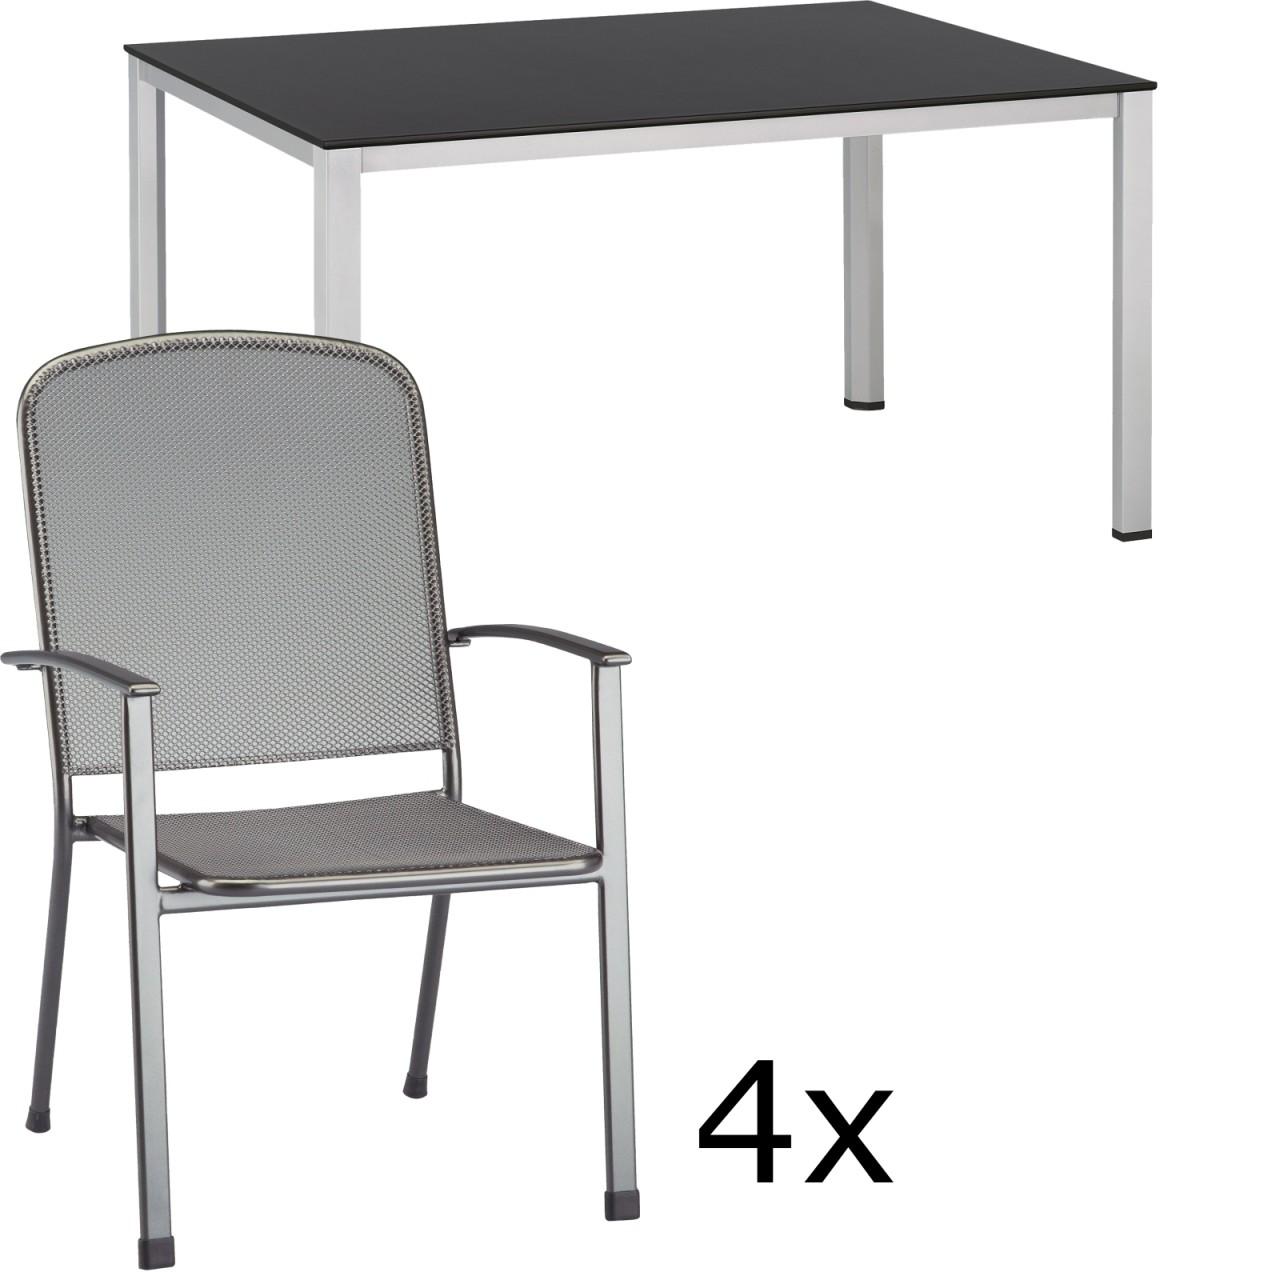 Gartenmöbel Set VIGO silber/anthrazit/eisengrau 5-tlg.